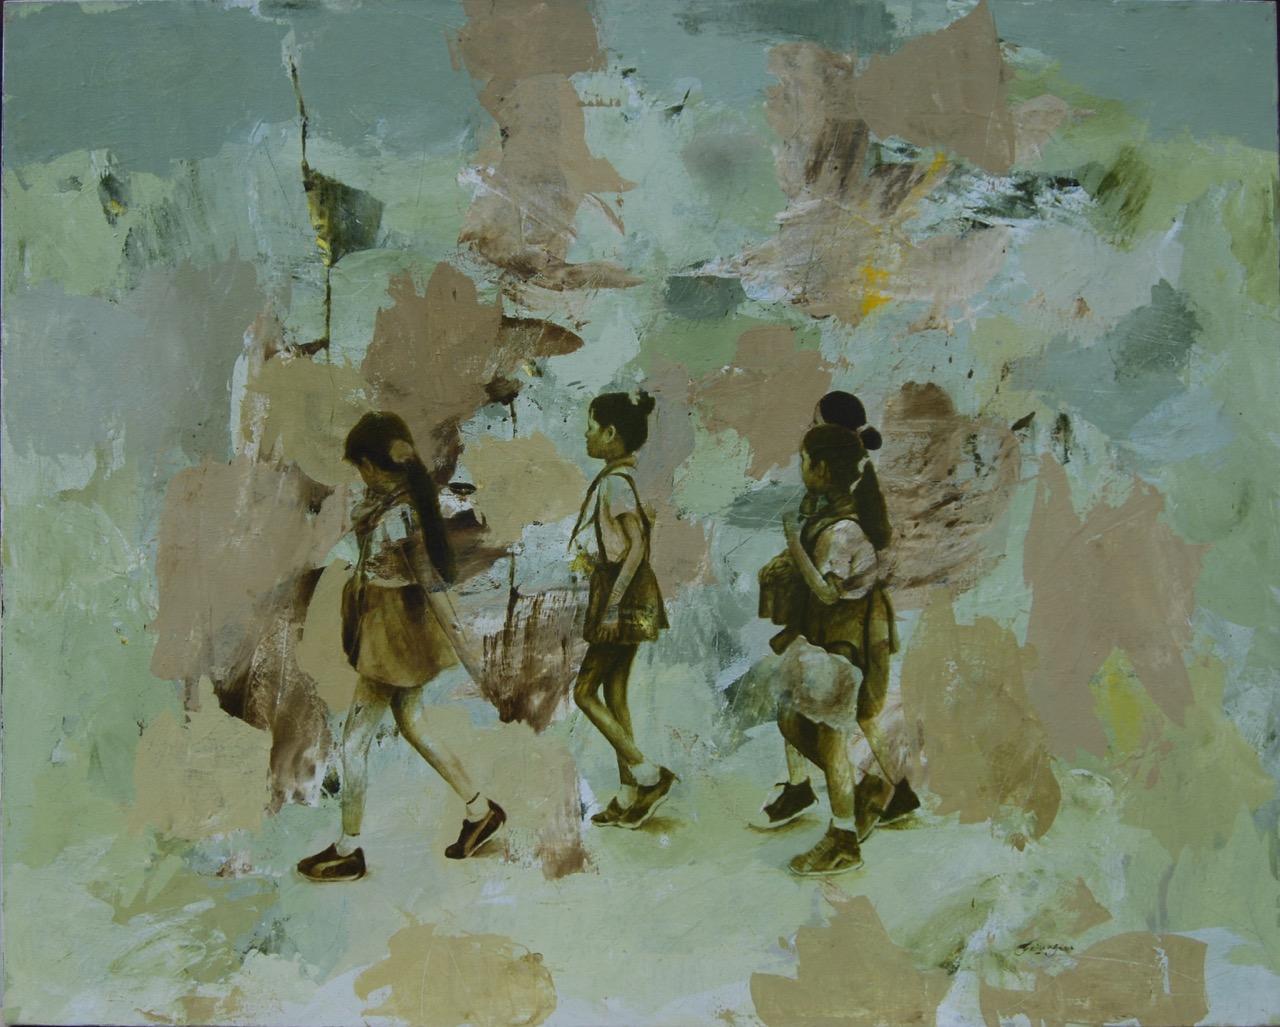 Walau-abstrak-teruslah-150x120cm-2016-ac-on-canvas